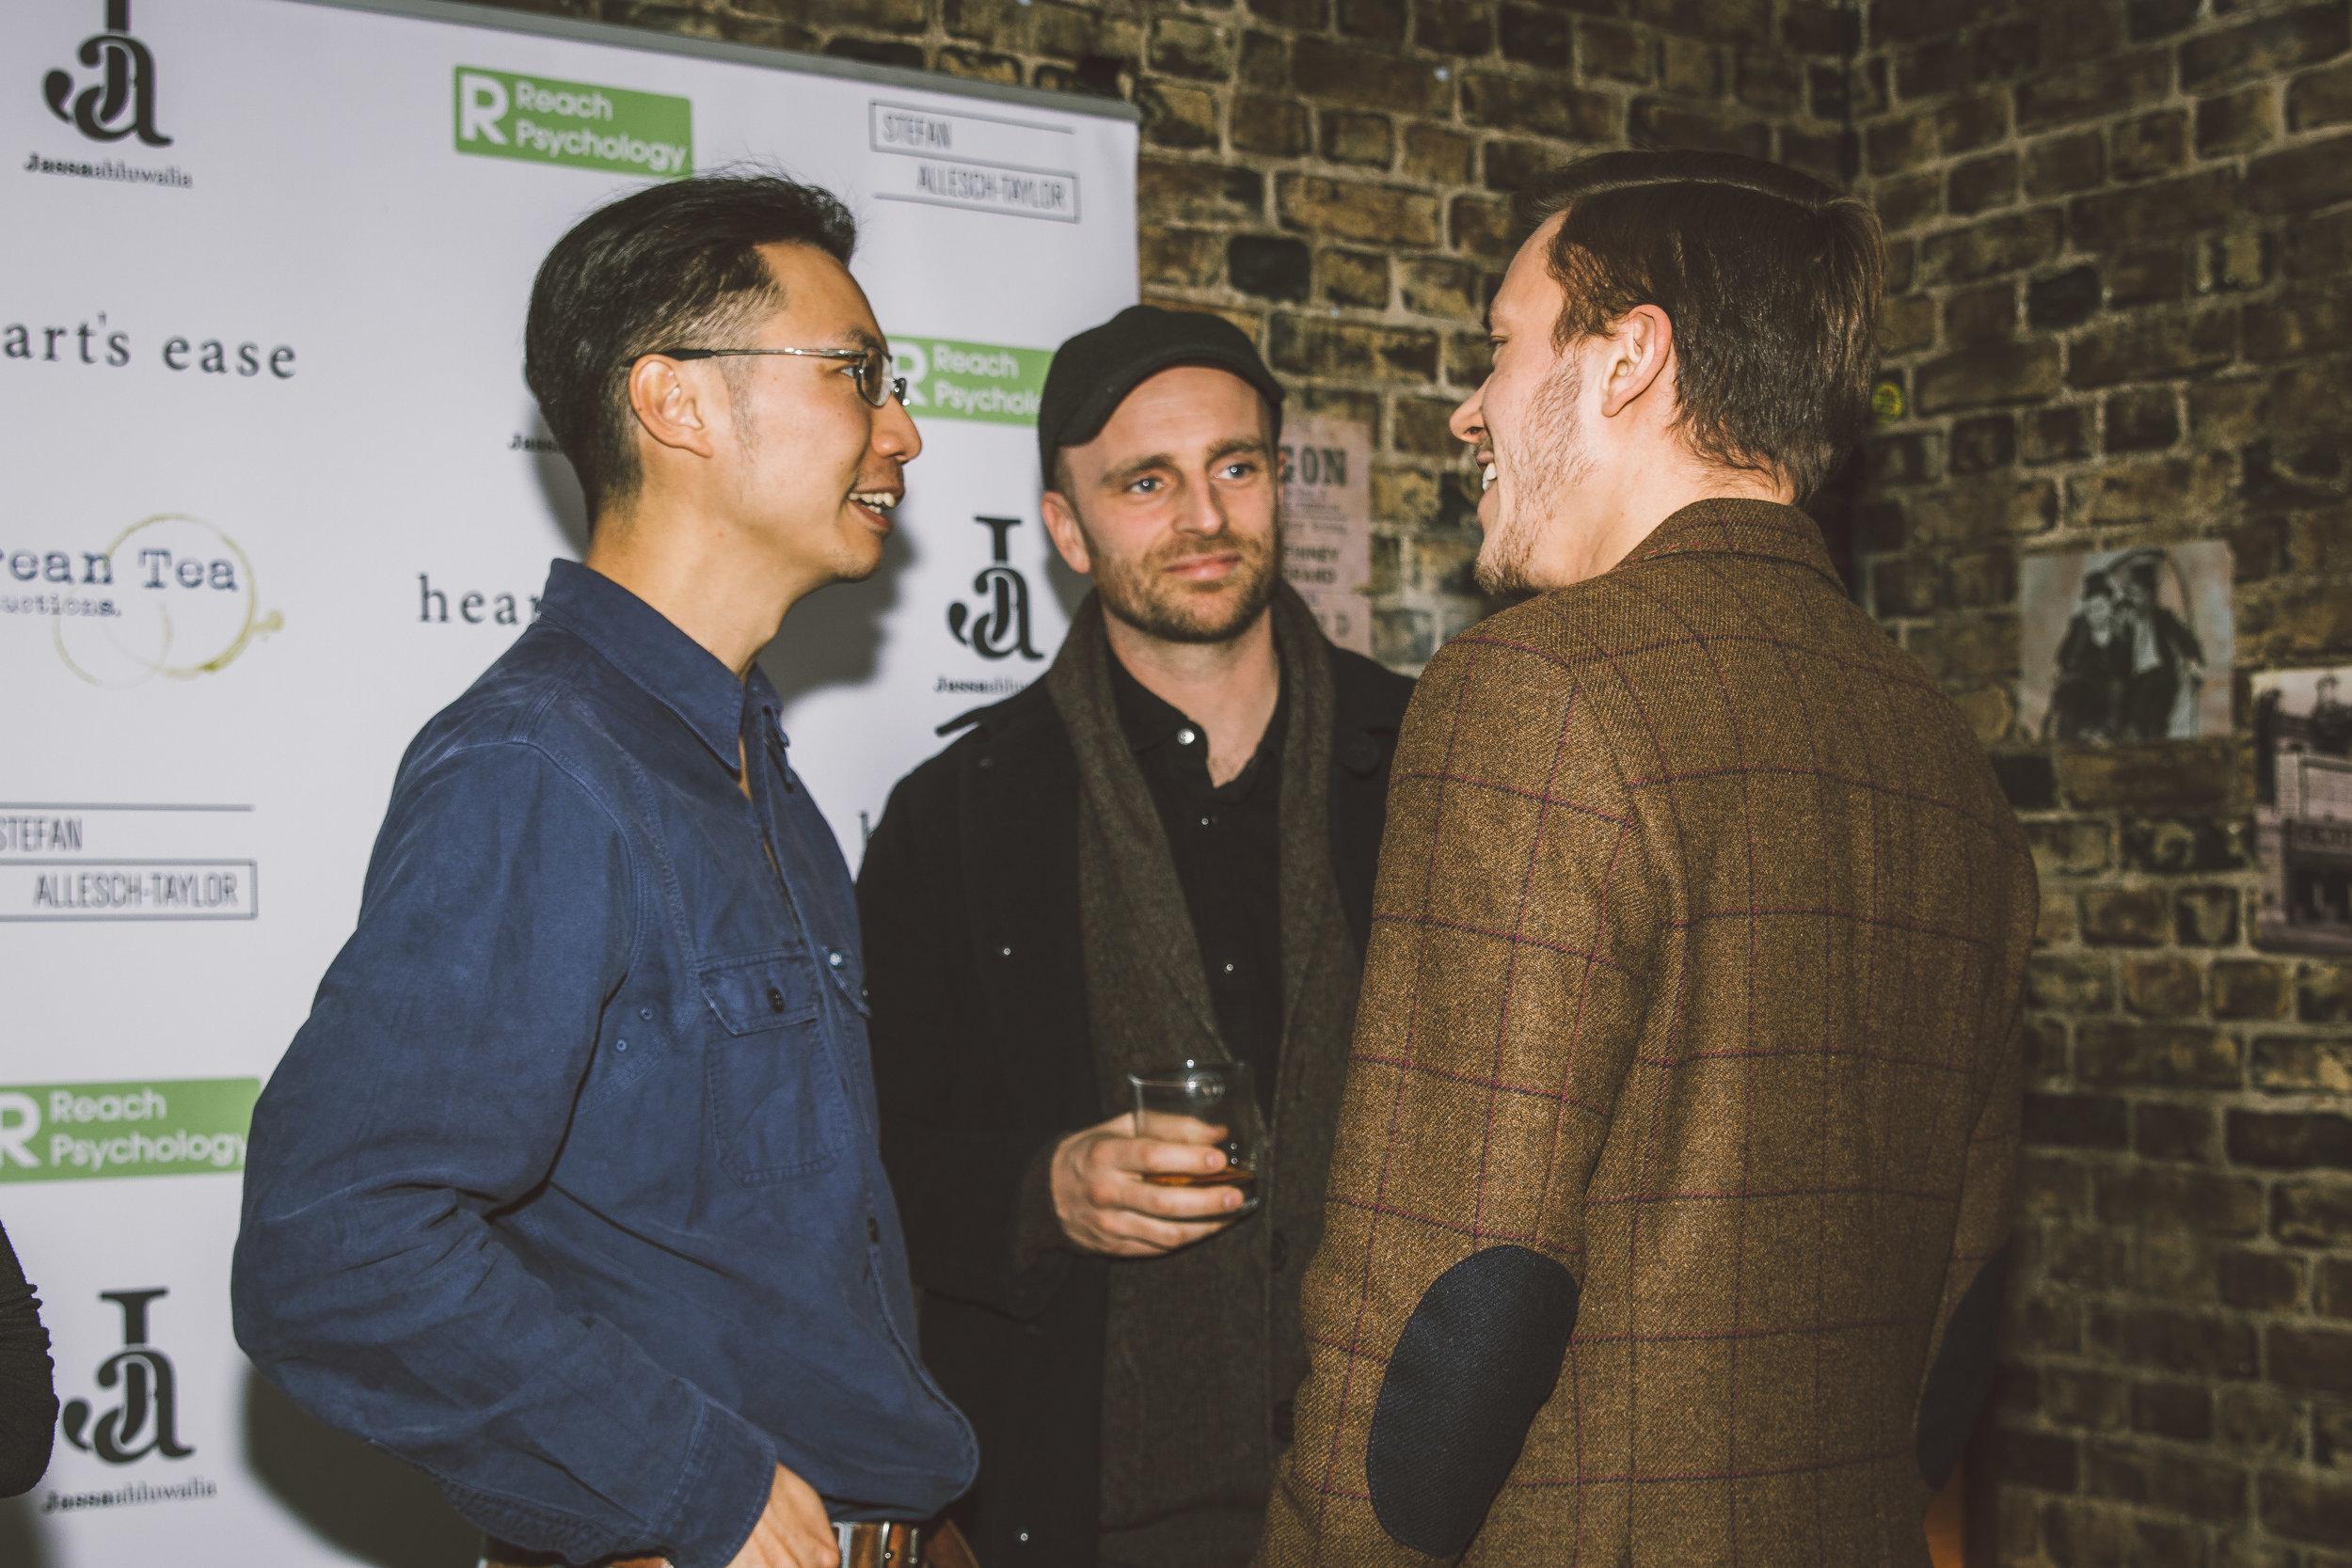 Christopher CF Chow, Matthew J Smith and Jassa Ahluwalia.